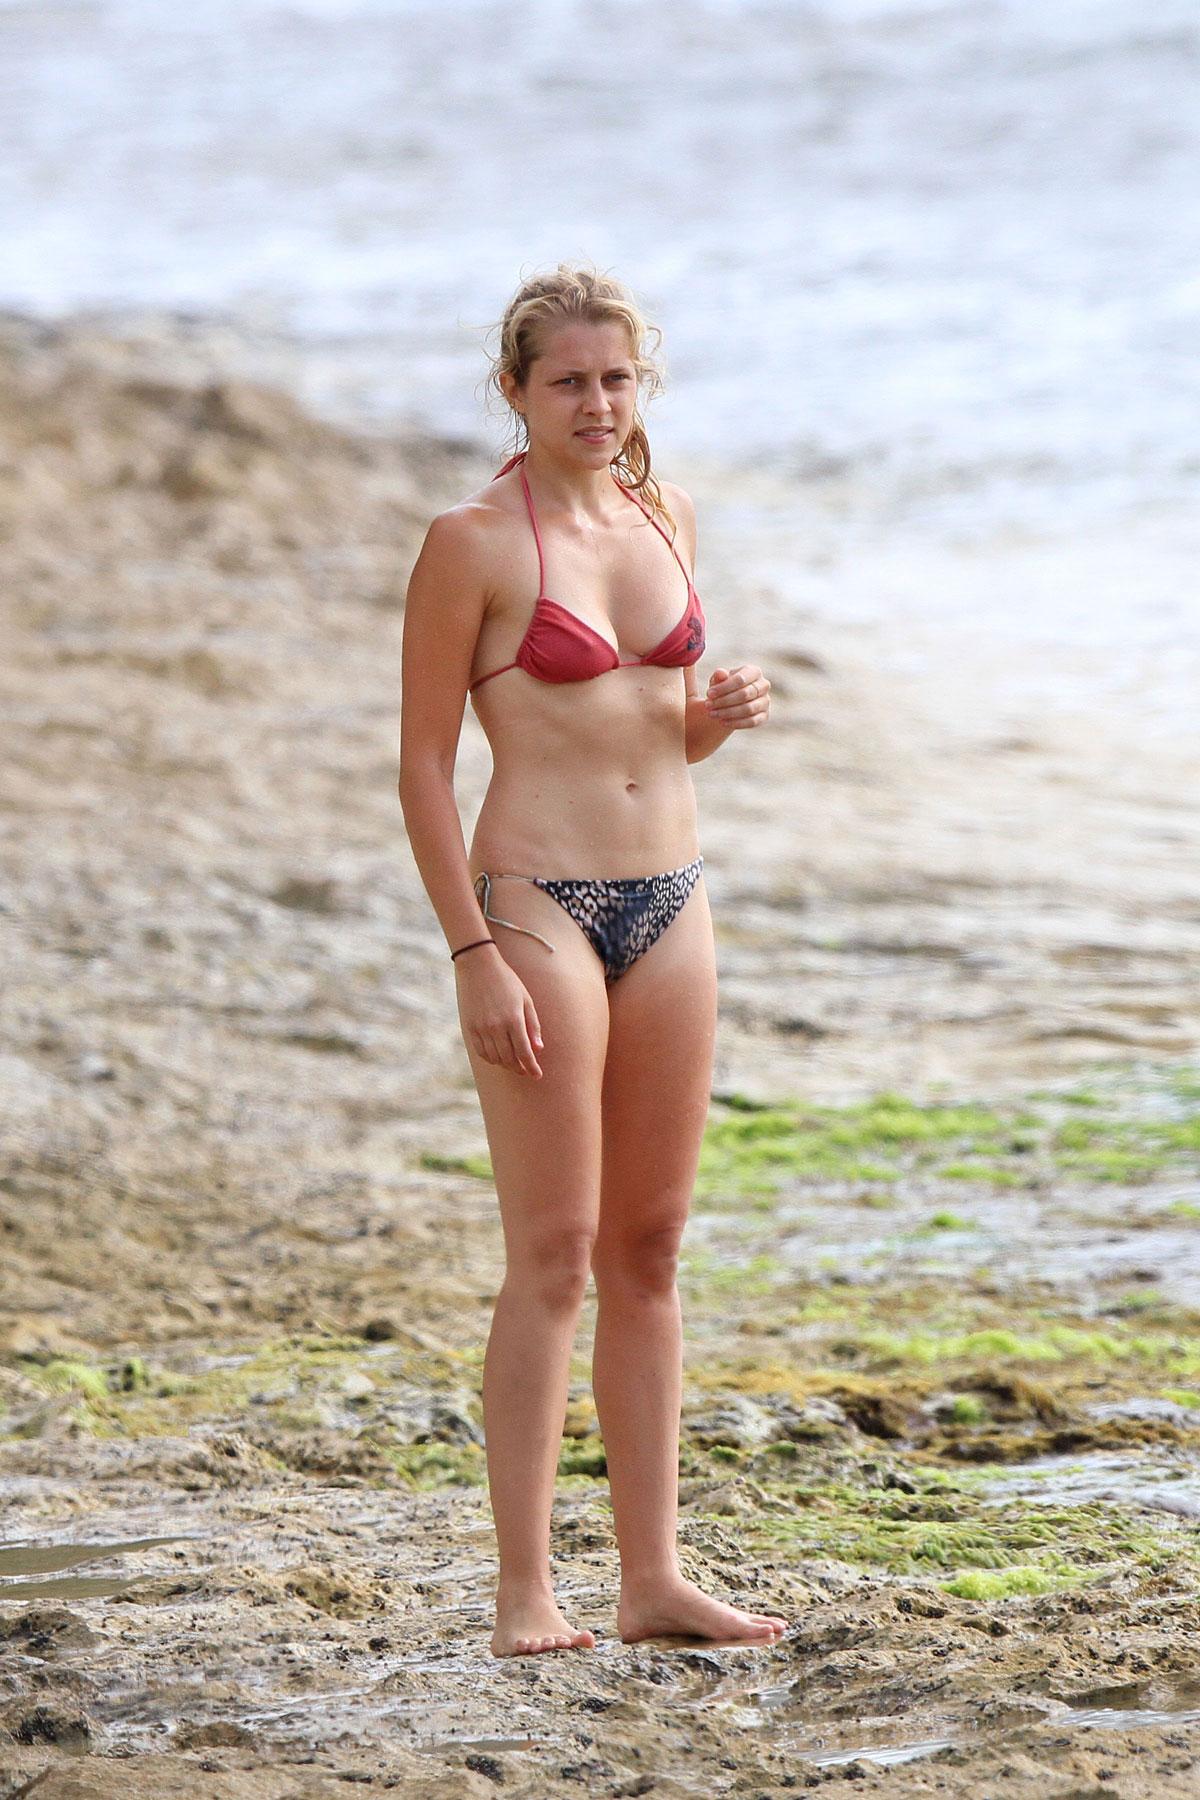 Teresa palmer in a bikini